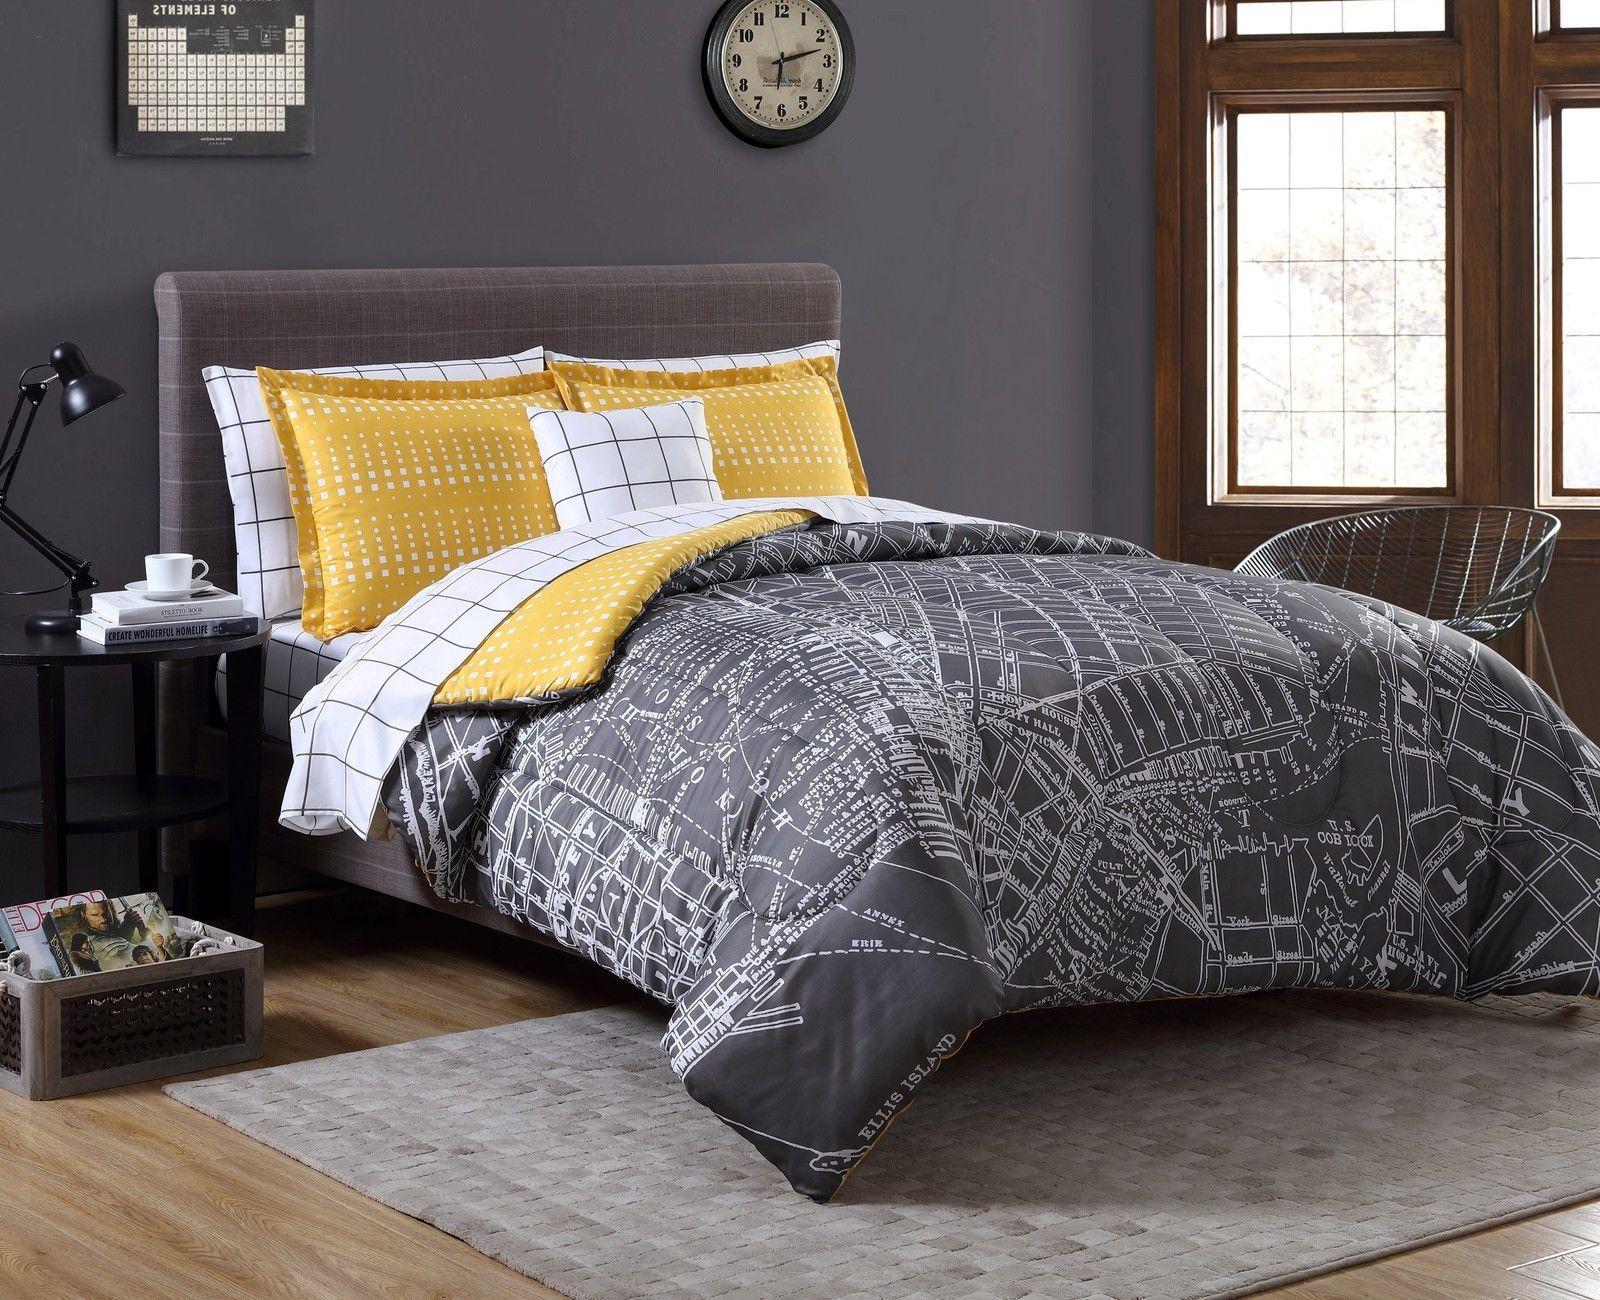 details about 6 piece twin xl complete bedding comforter set modern